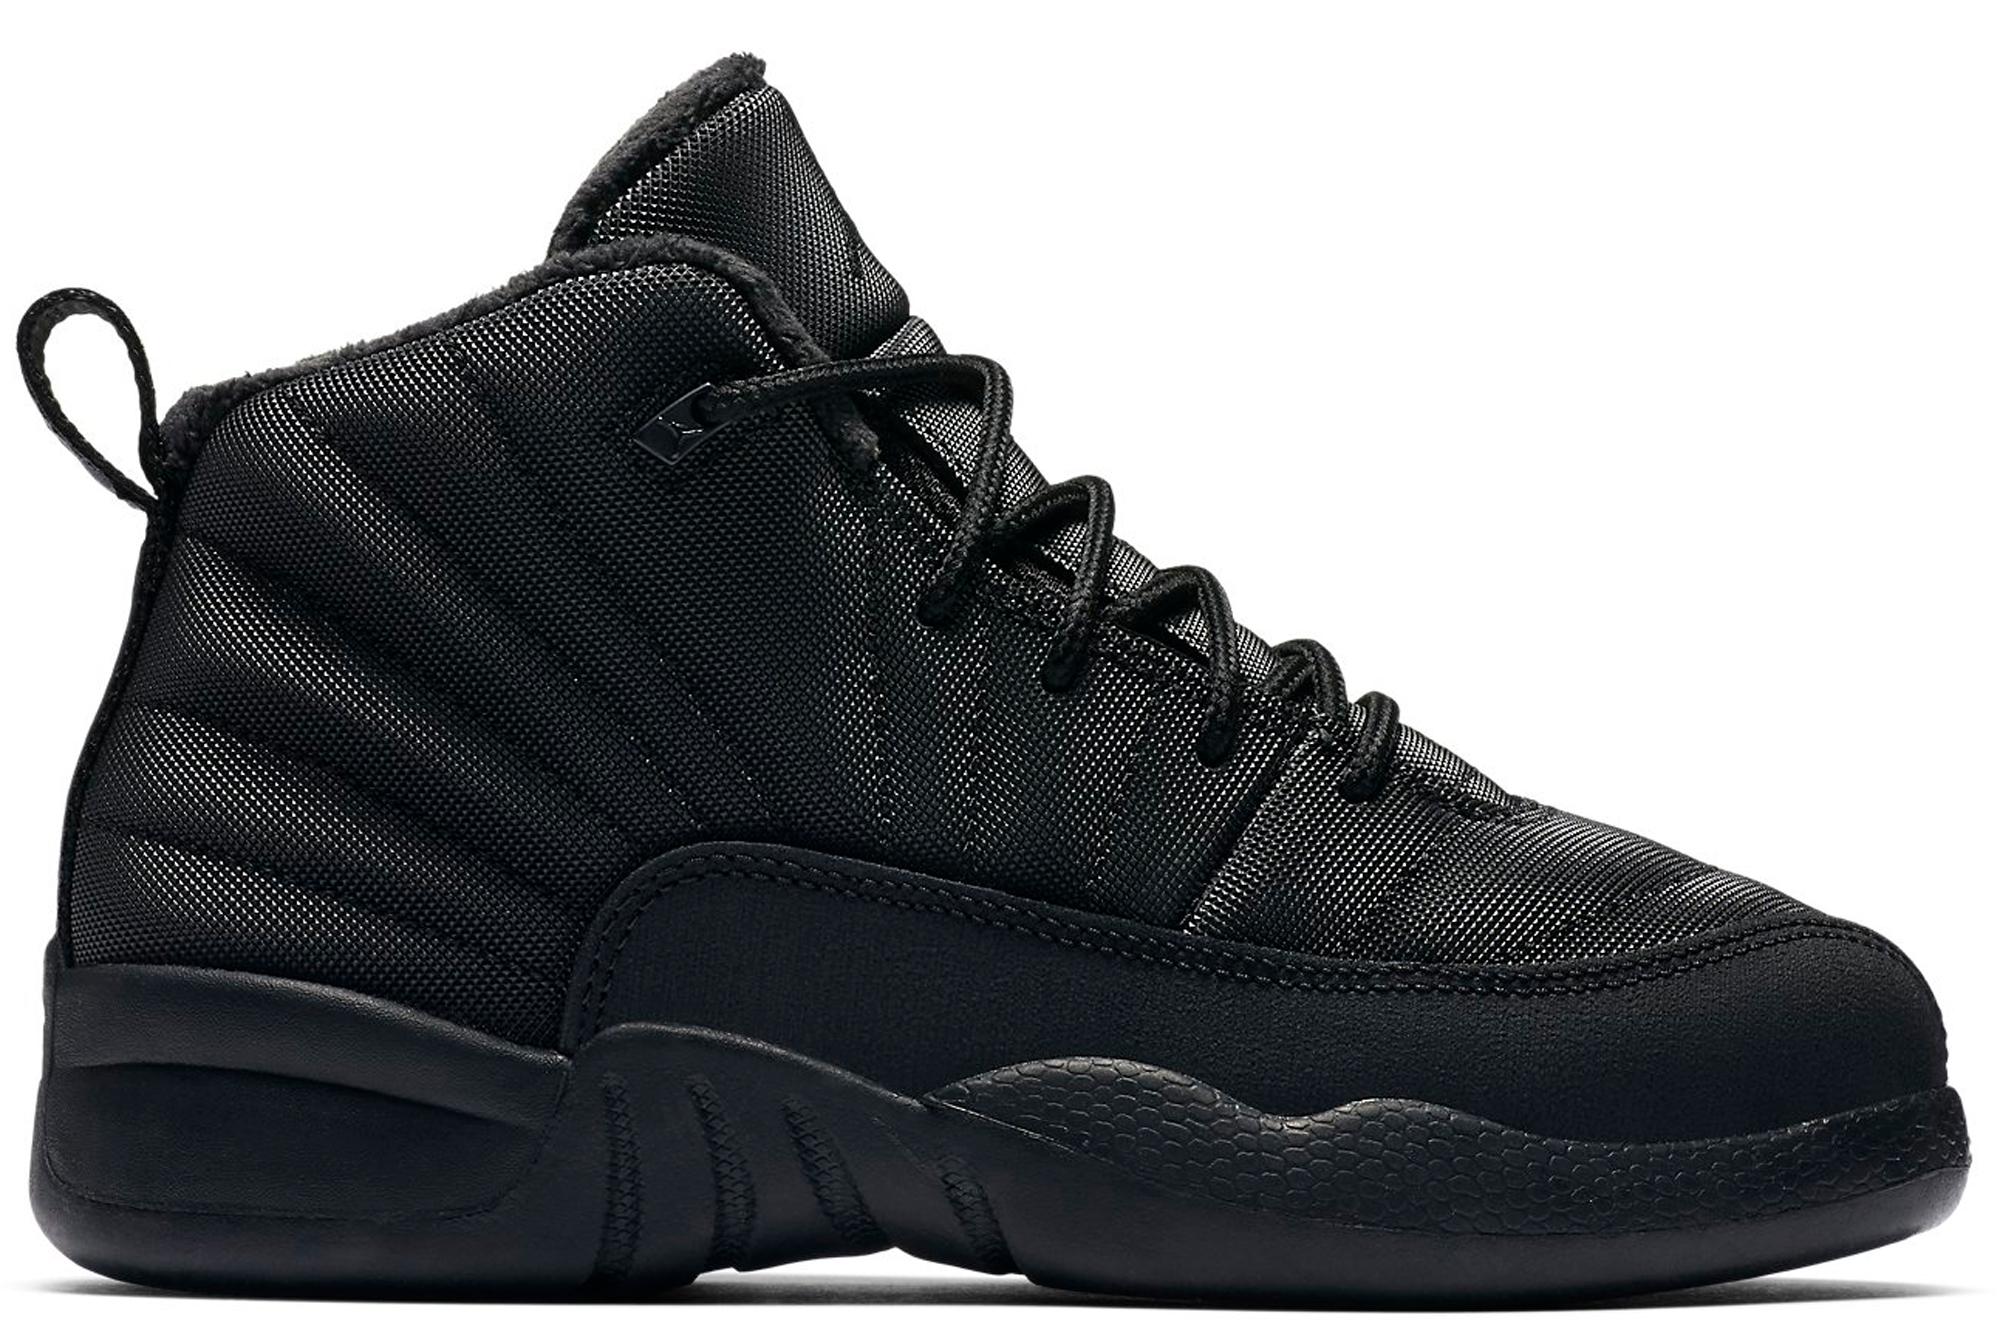 Jordan 12 Retro Winter Black (PS)